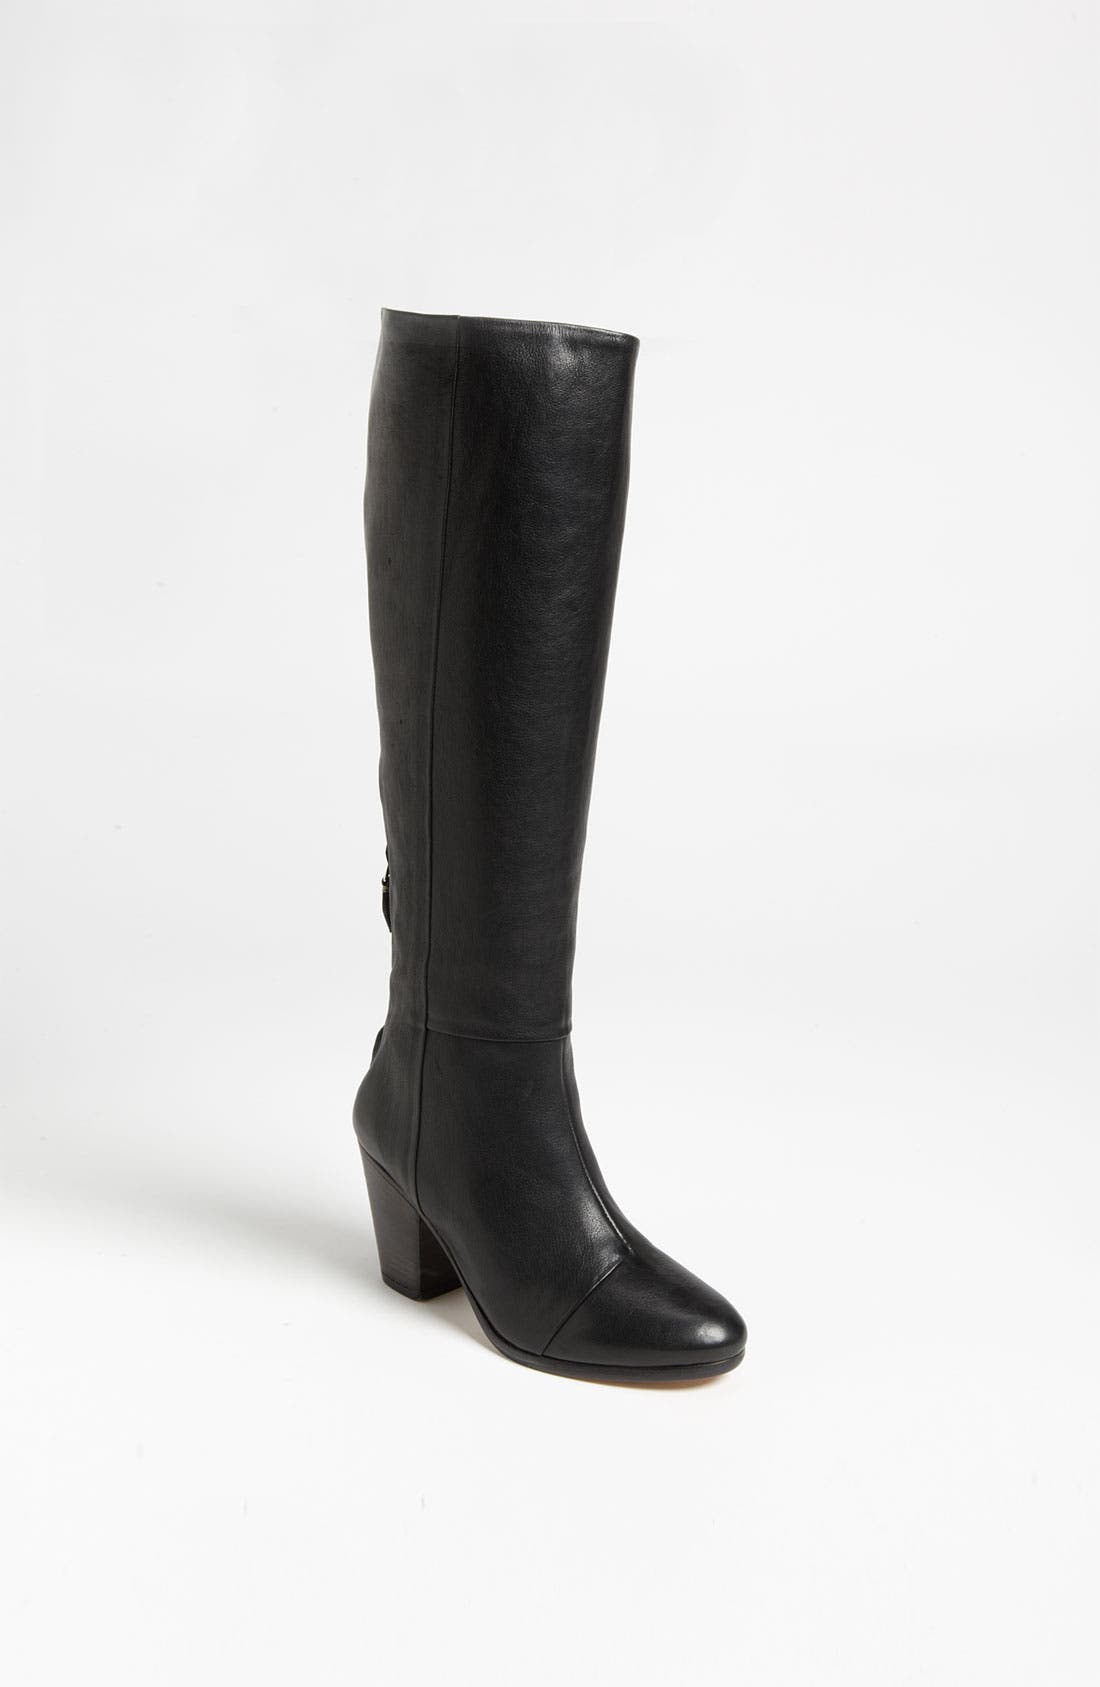 Alternate Image 1 Selected - rag & bone 'Newbury' Knee High Boot